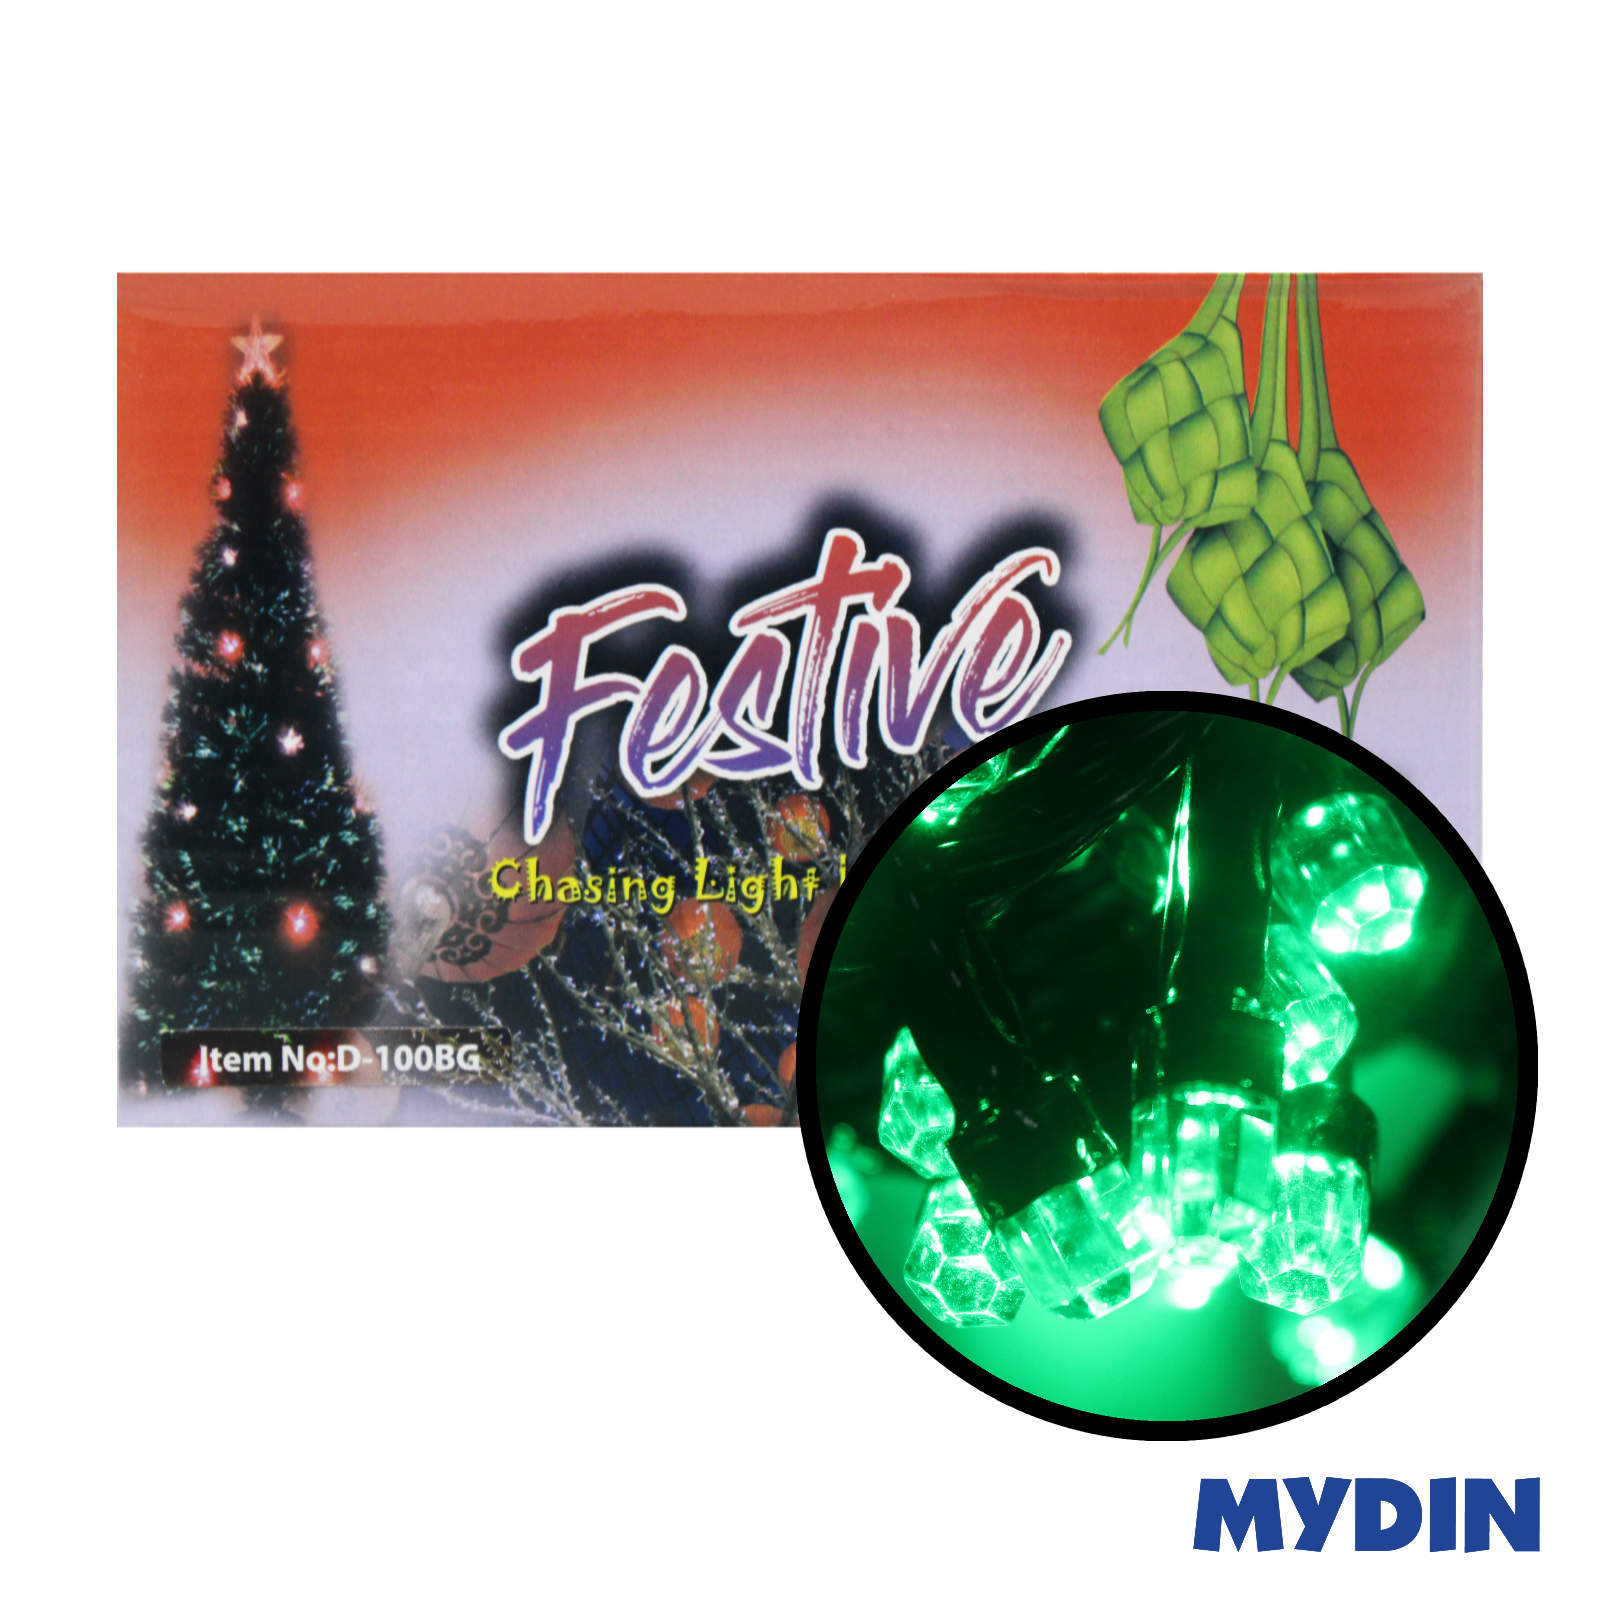 Festive Chasing Light Diamond LED 100B Green